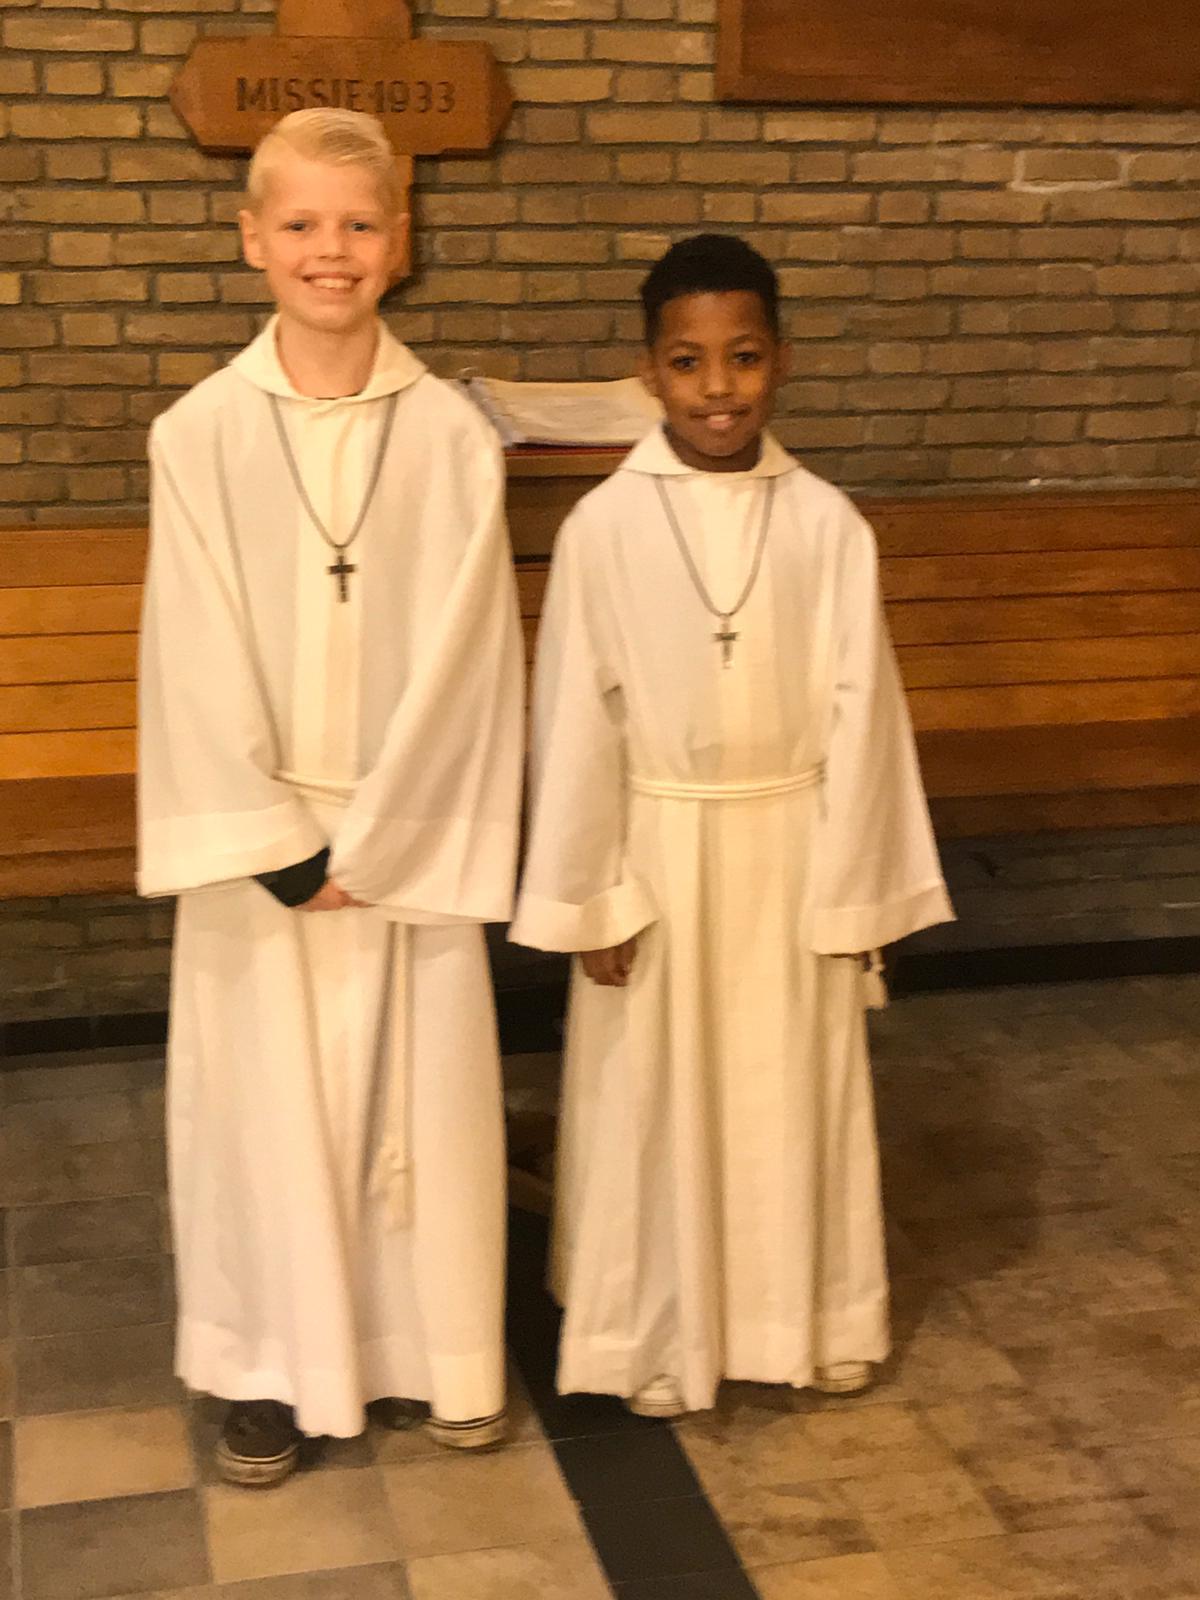 Misdienaars Willem en Jaceon